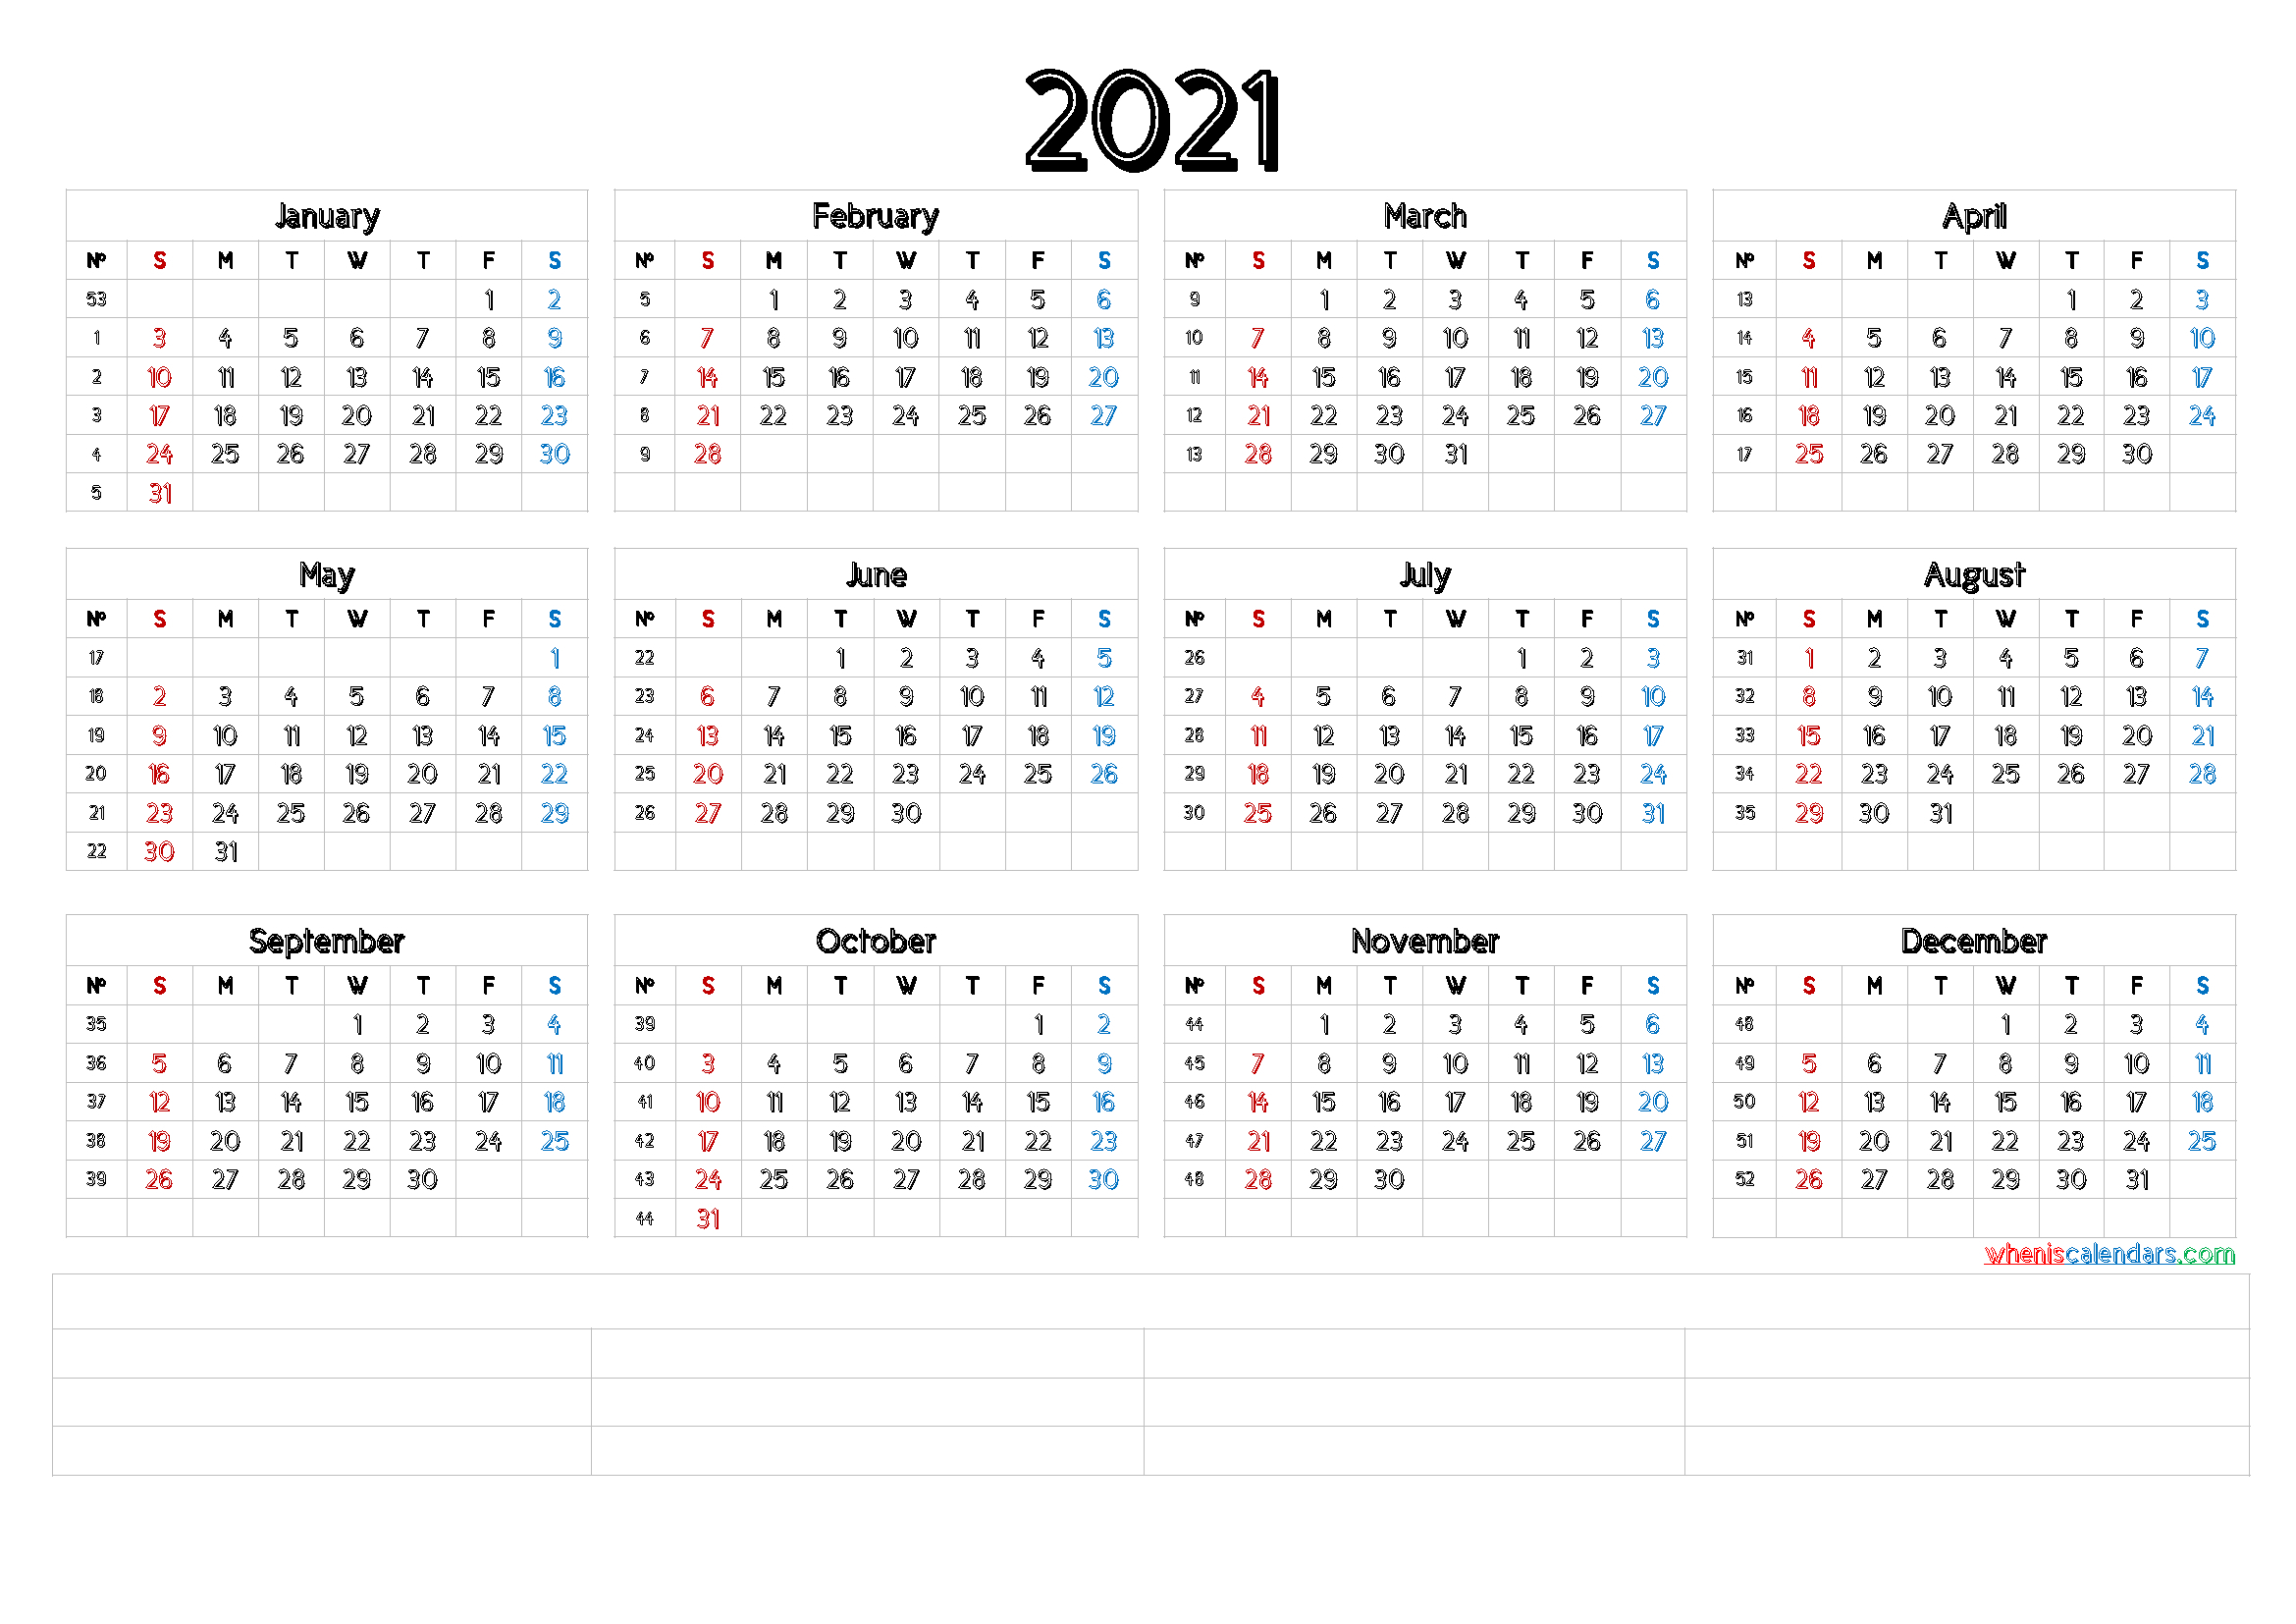 2021 Annual Calendar Printable (6 Templates)